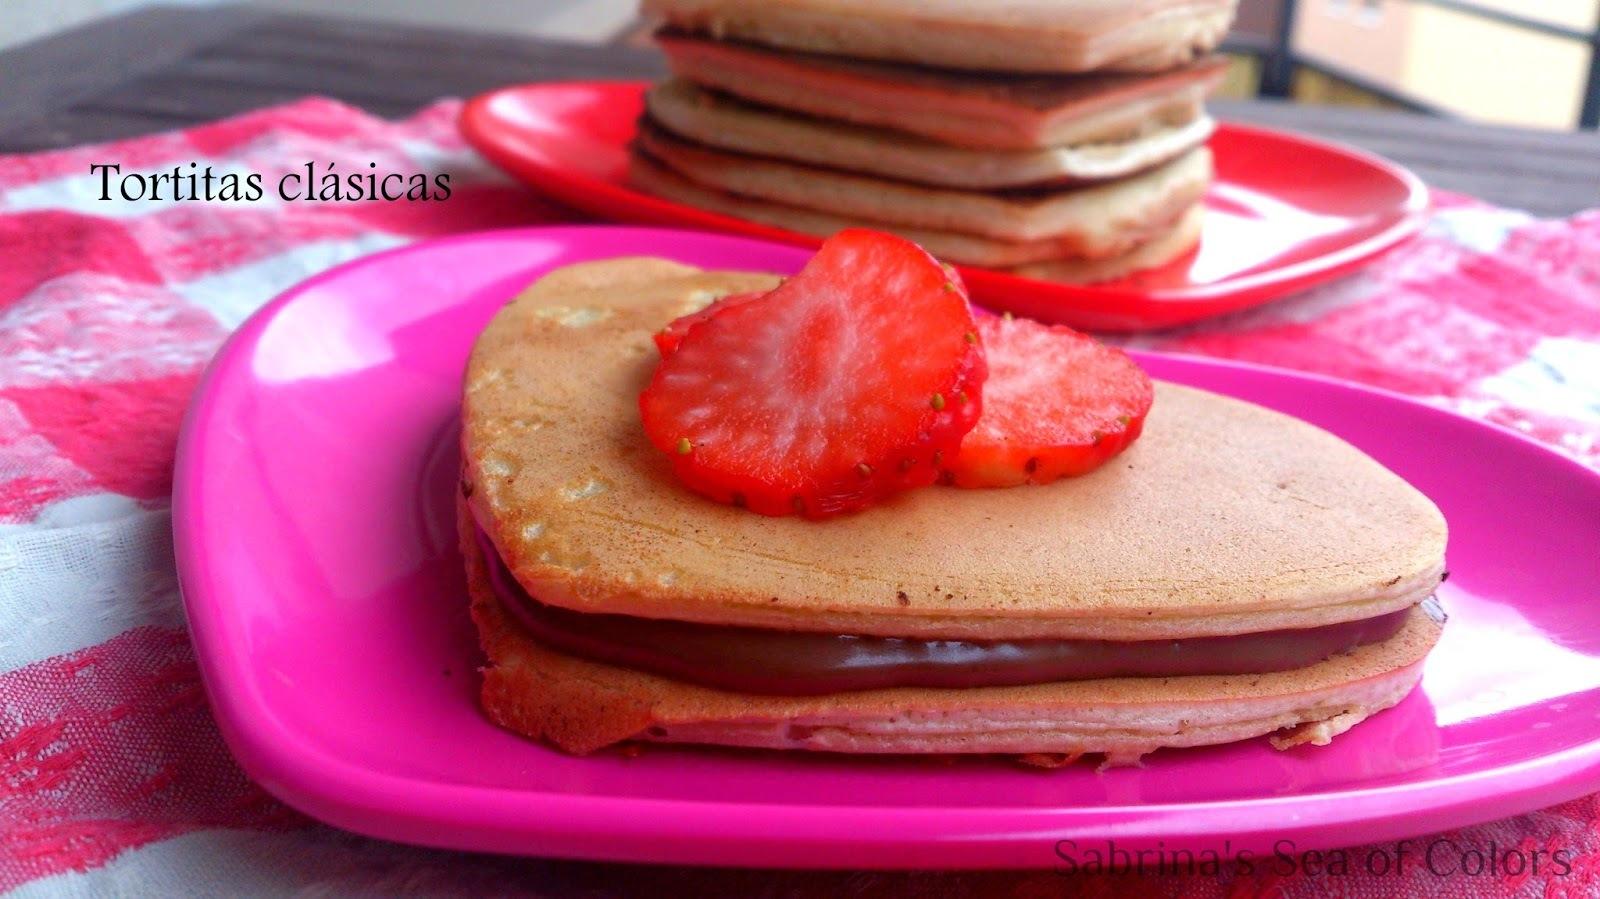 Tortitas americanas, receta clásica. Pancakes